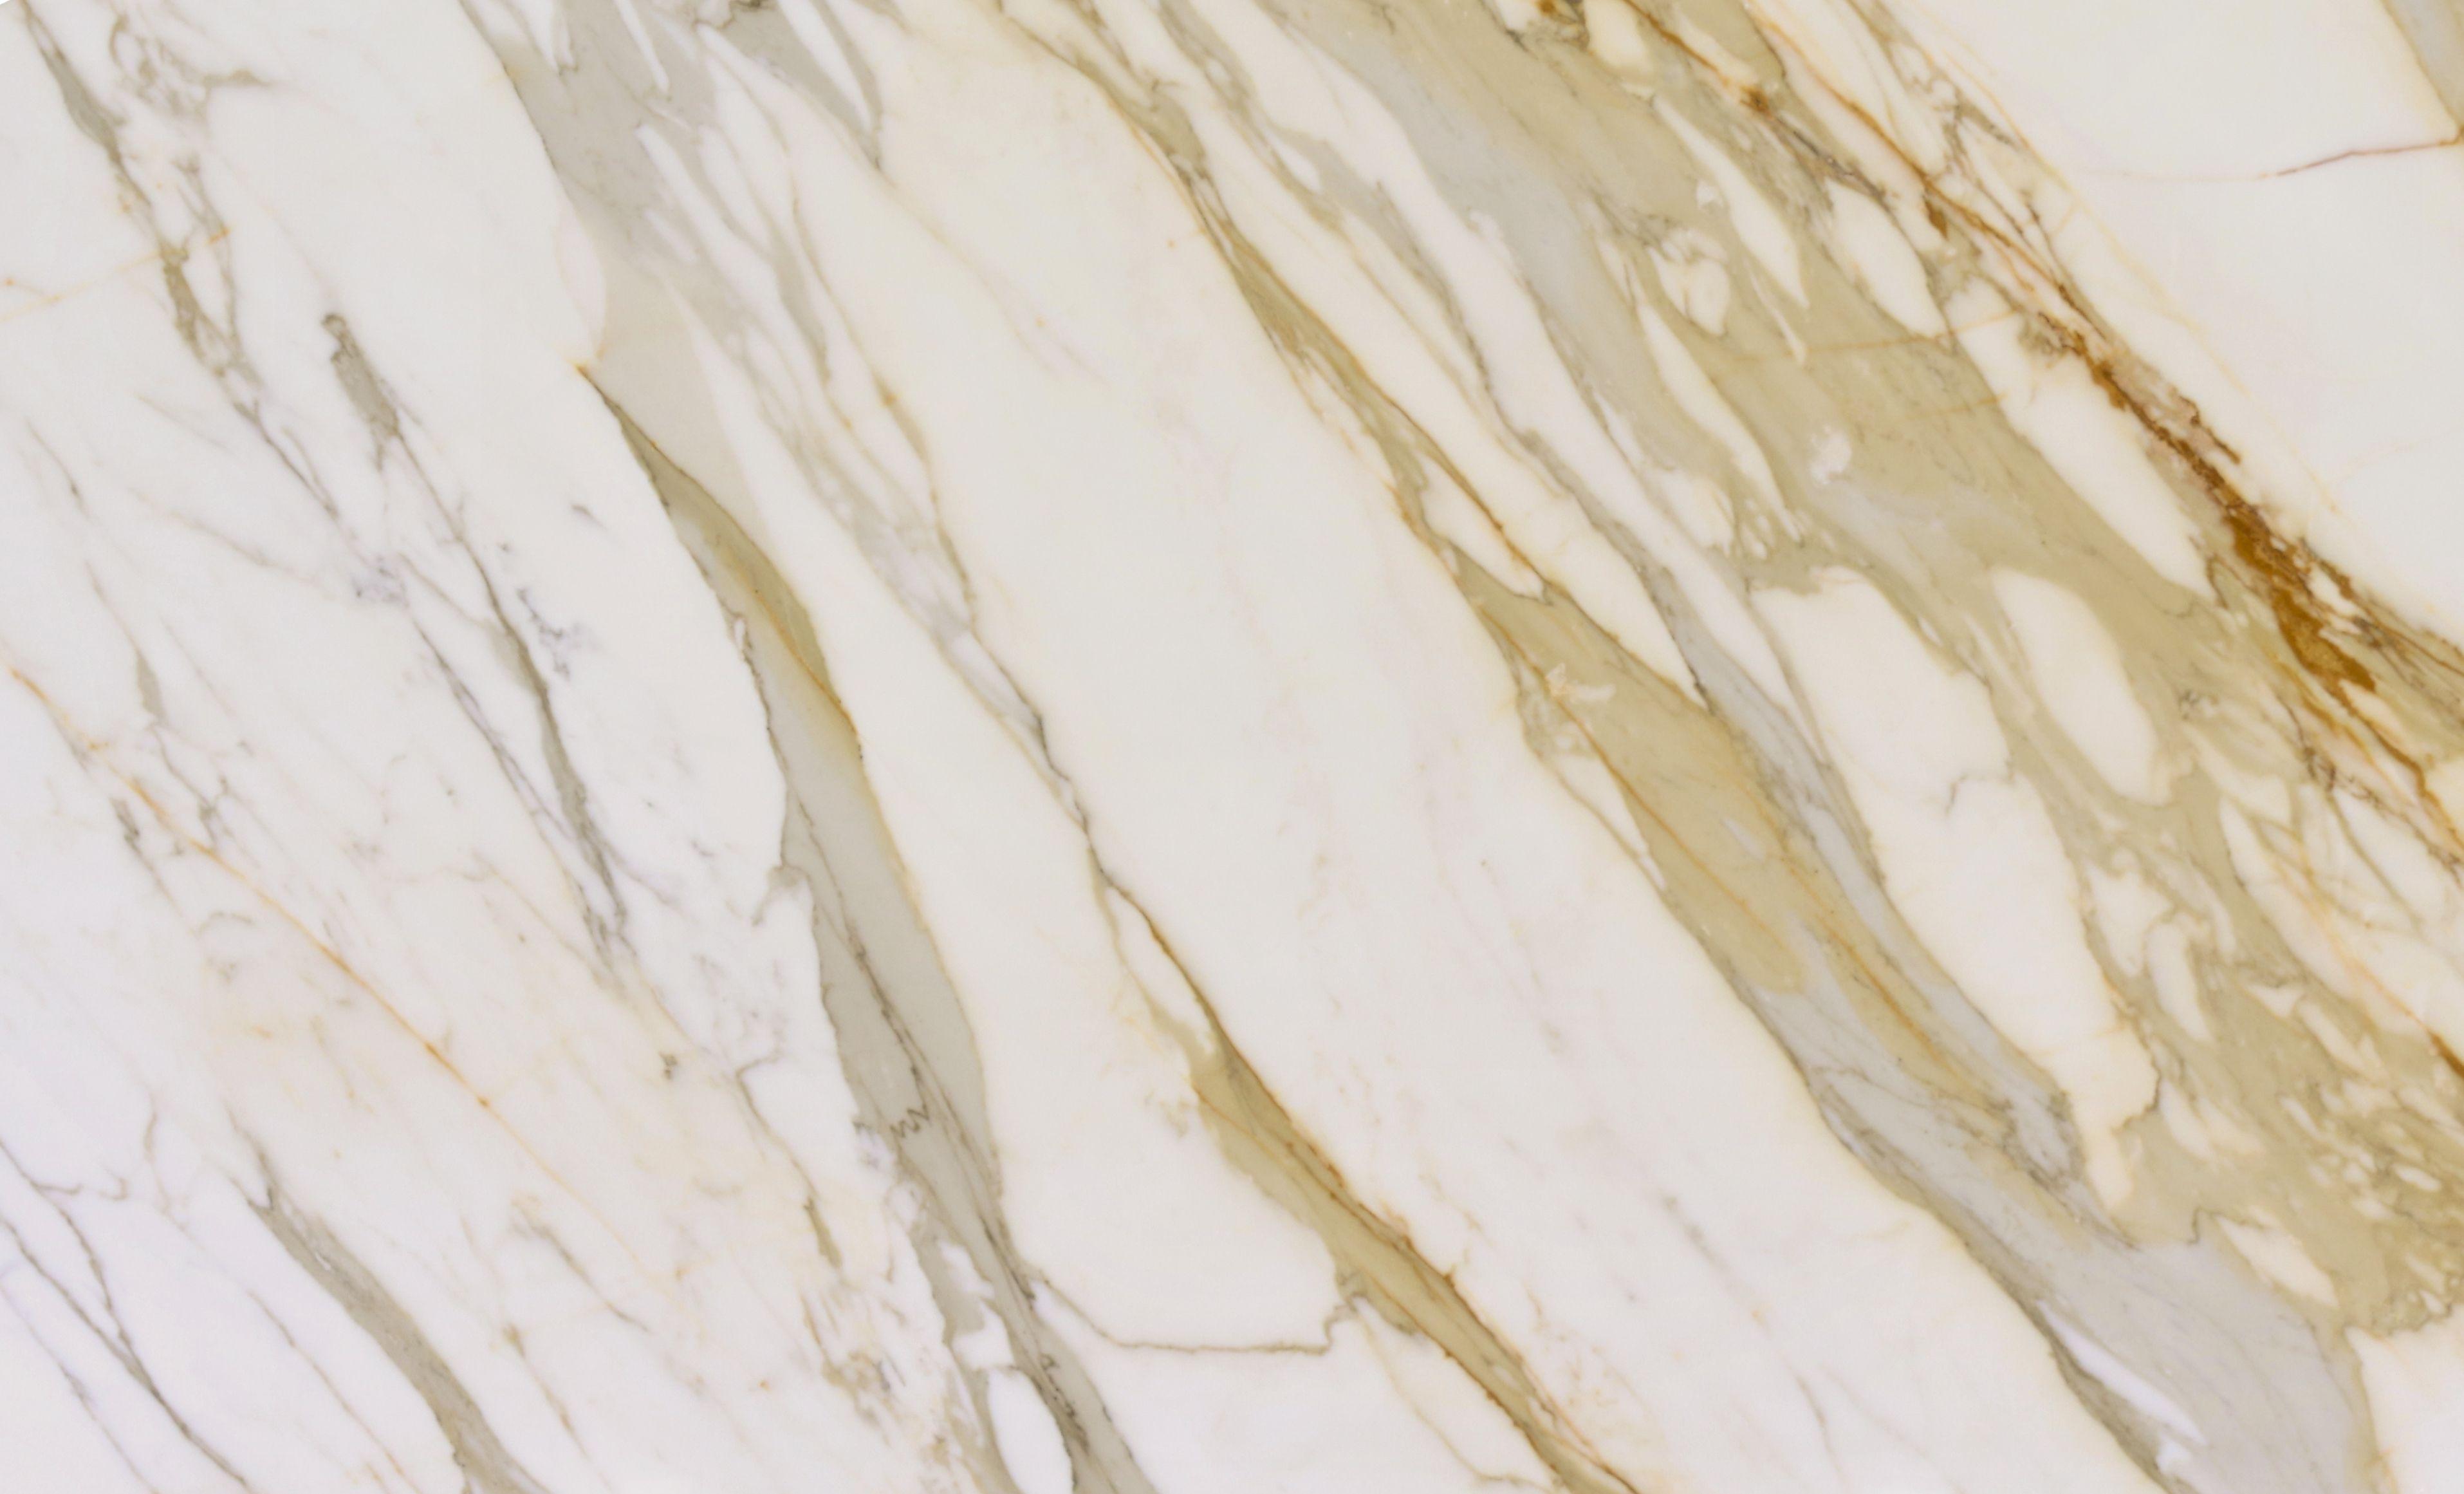 Calacatta Gold Borghini Paonazzo Marble Calacatta Gold Marble Calacatta Gold Calacatta